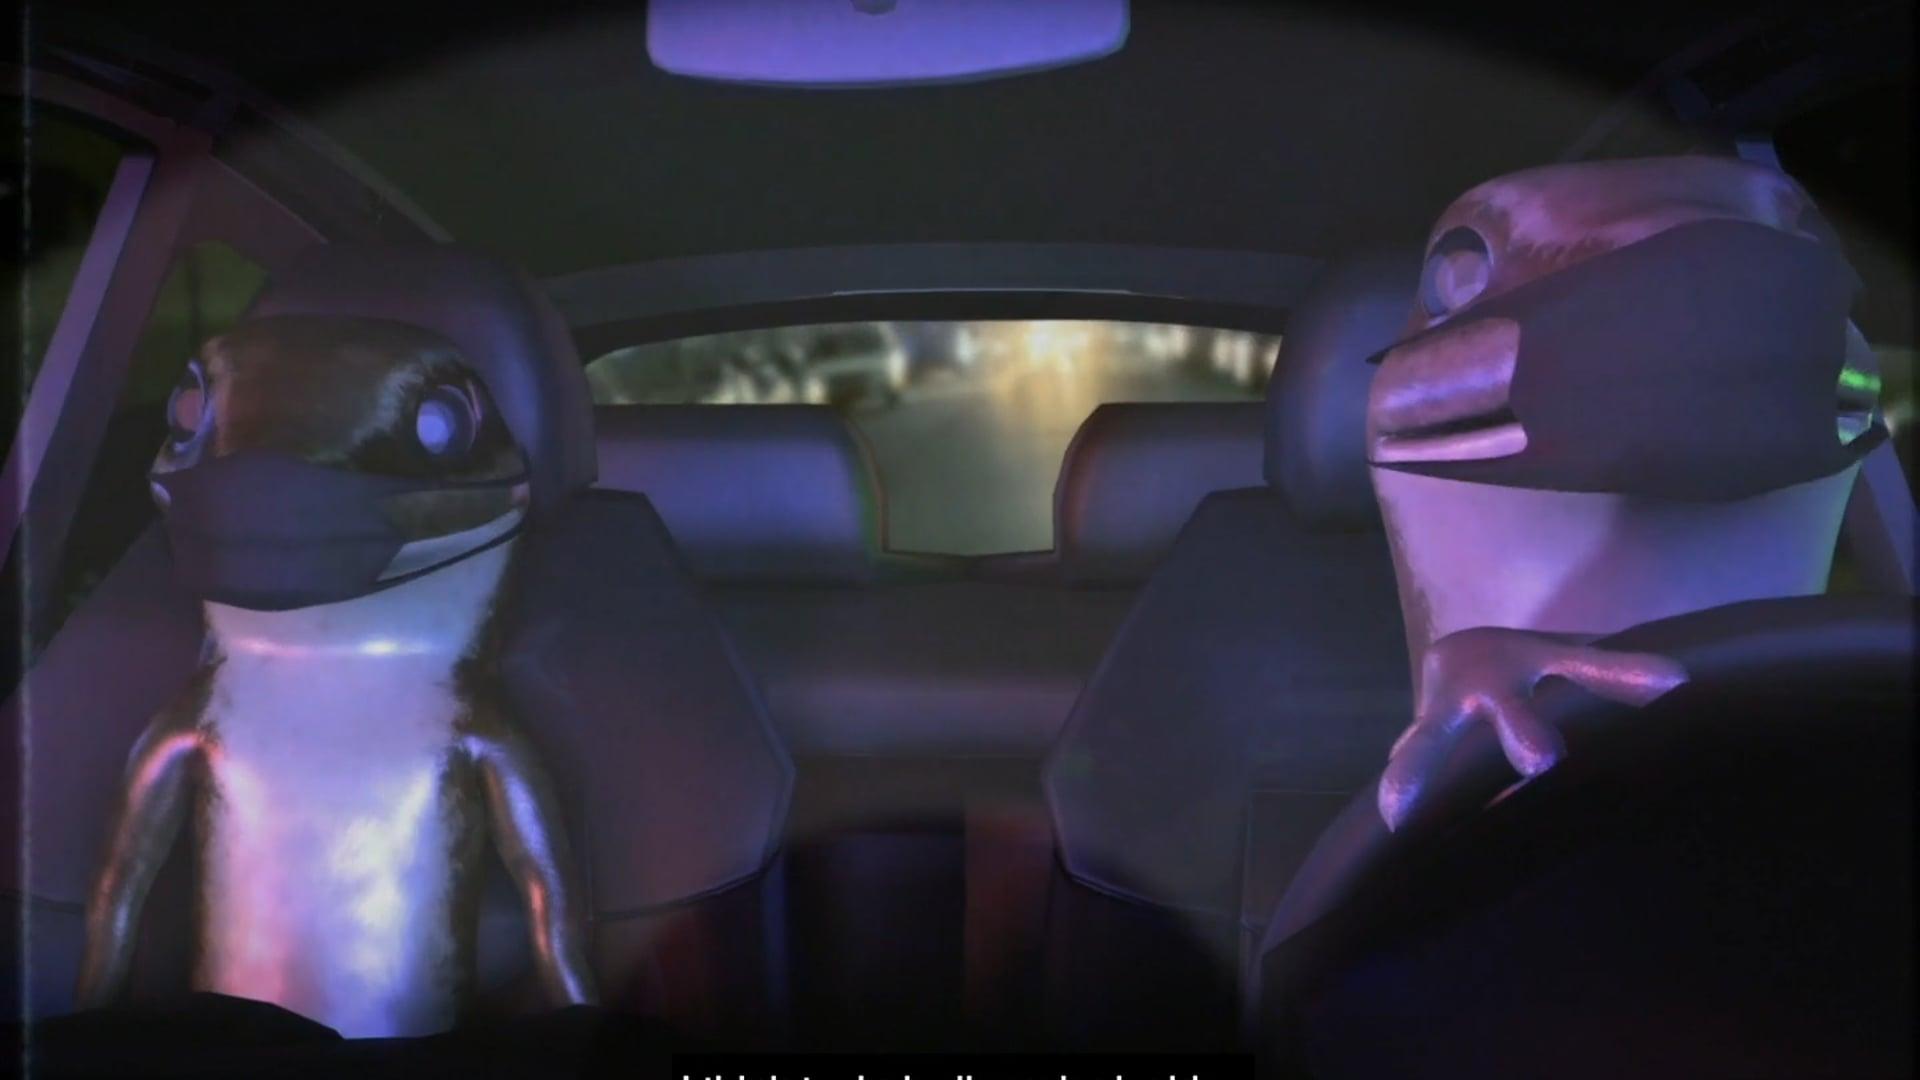 Orian Barki and Meriem Bennani, 2 Lizards: Episode 2, 2020